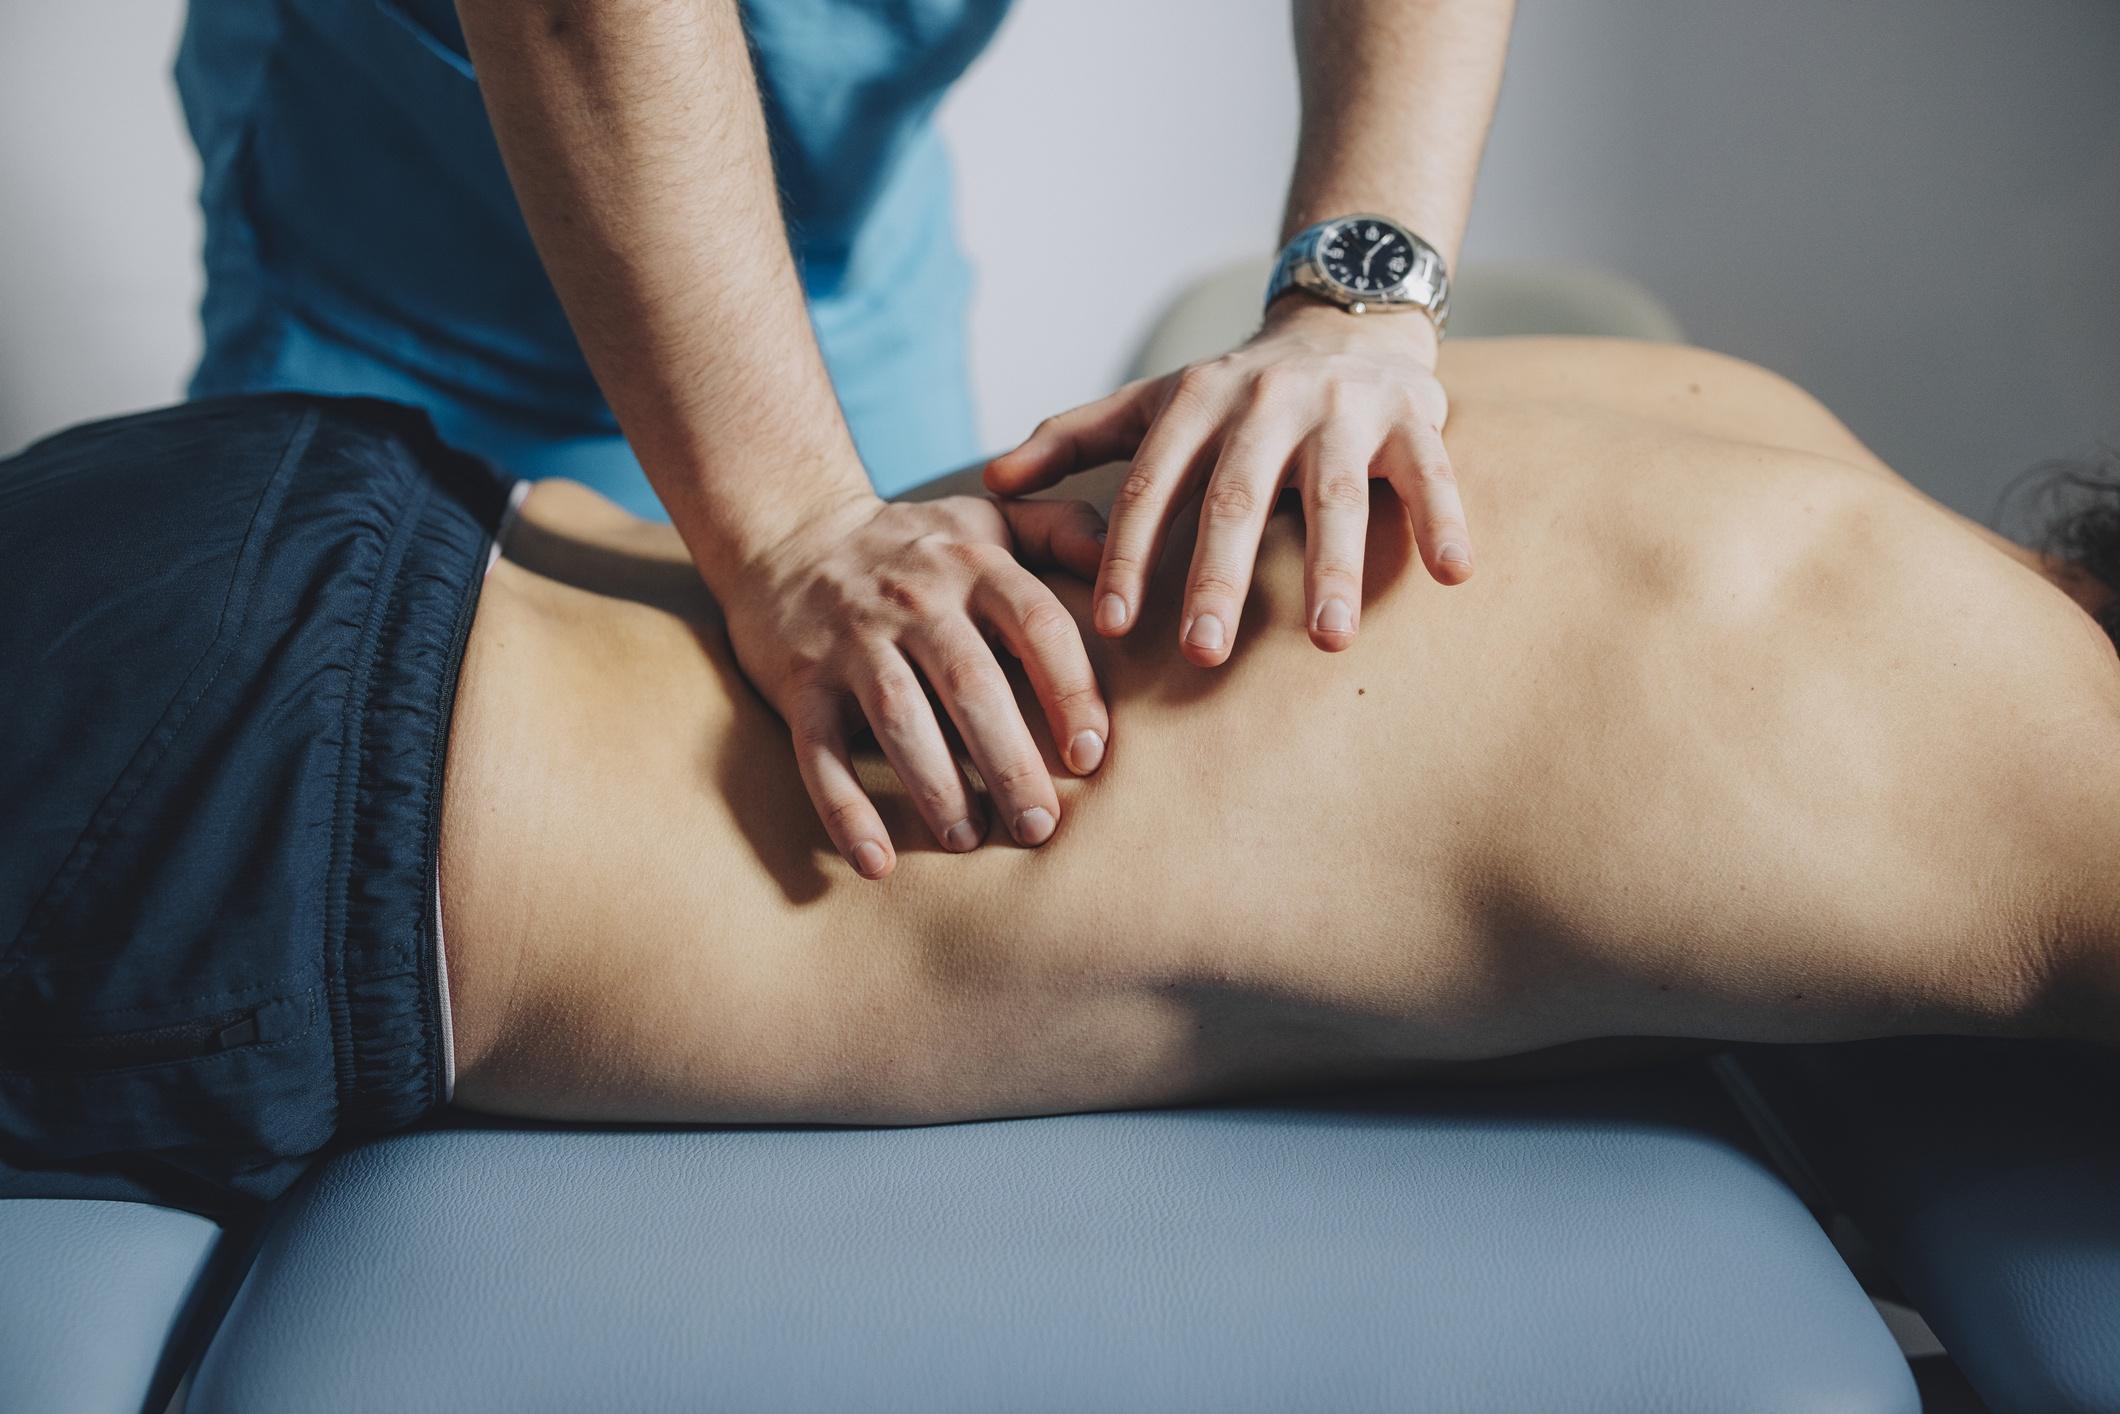 Read more about the article Jaka różnica jest między fizjoterapią a fizykoterapią?